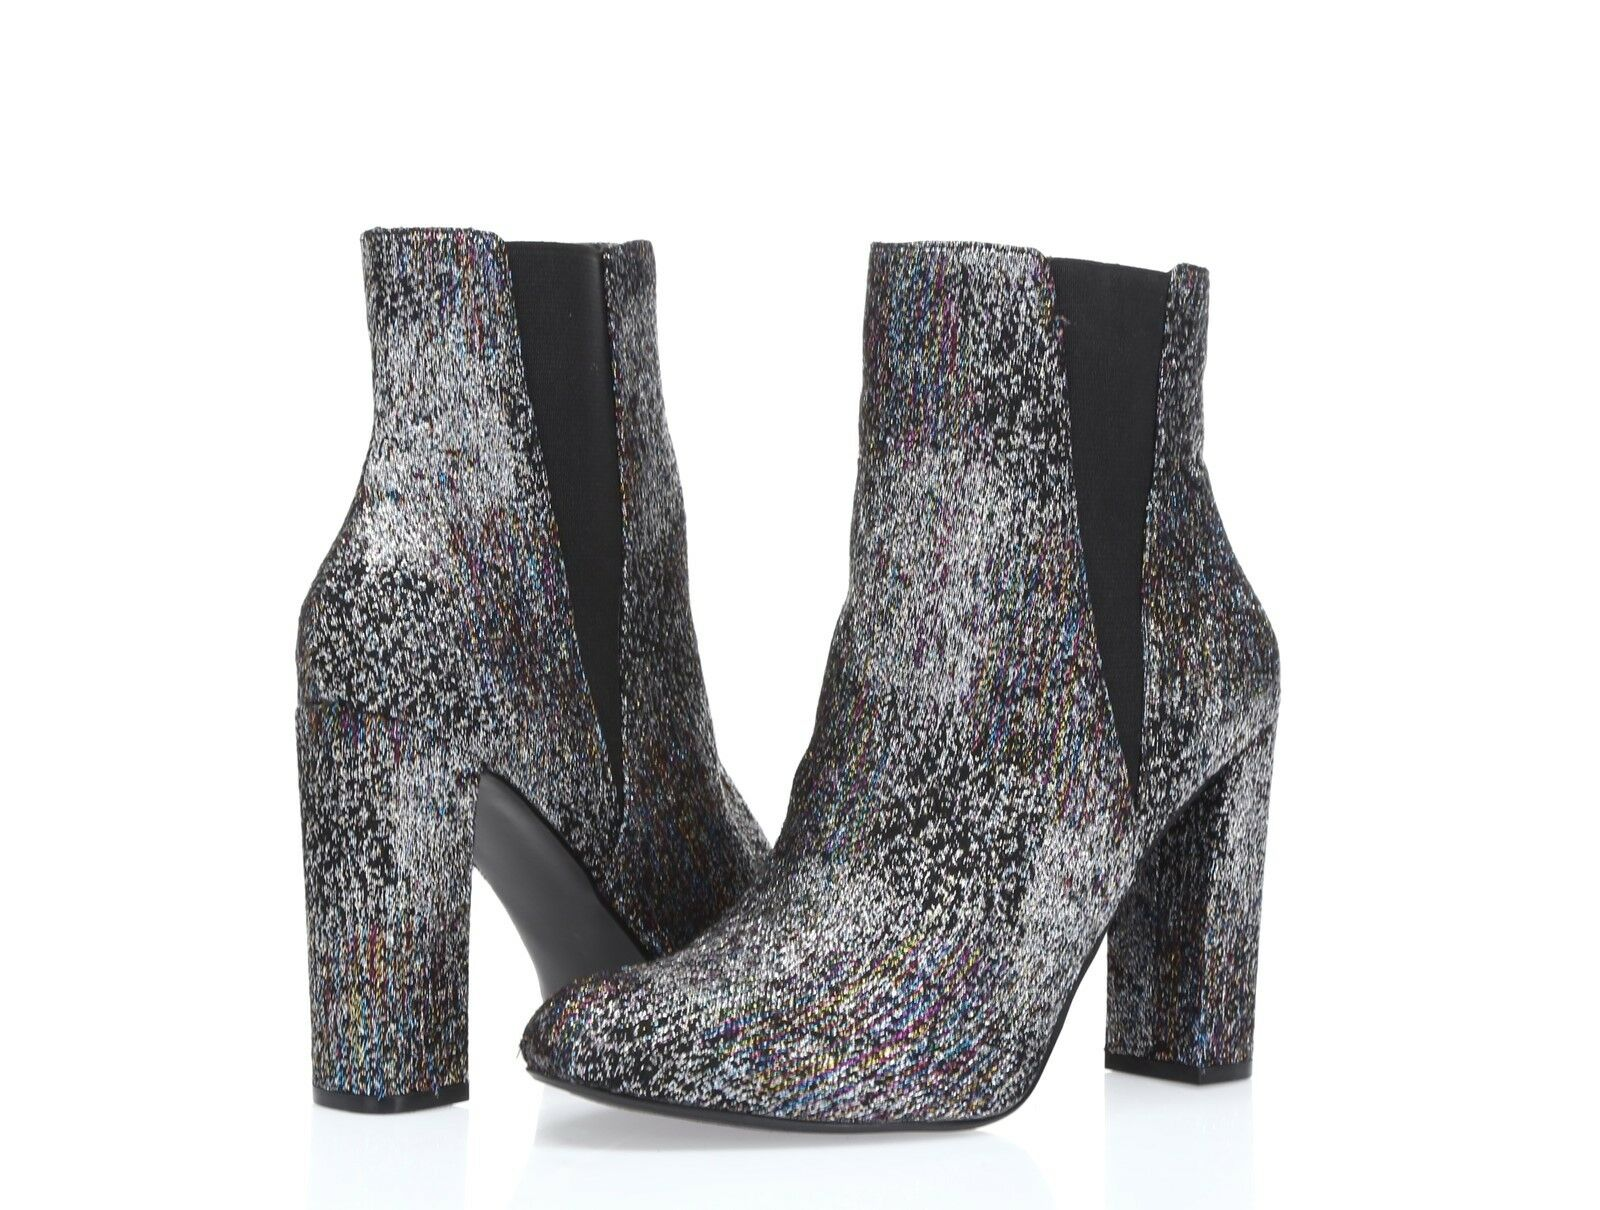 Steve Madden Effect Women's black glitter block heel booties sz. 7 M